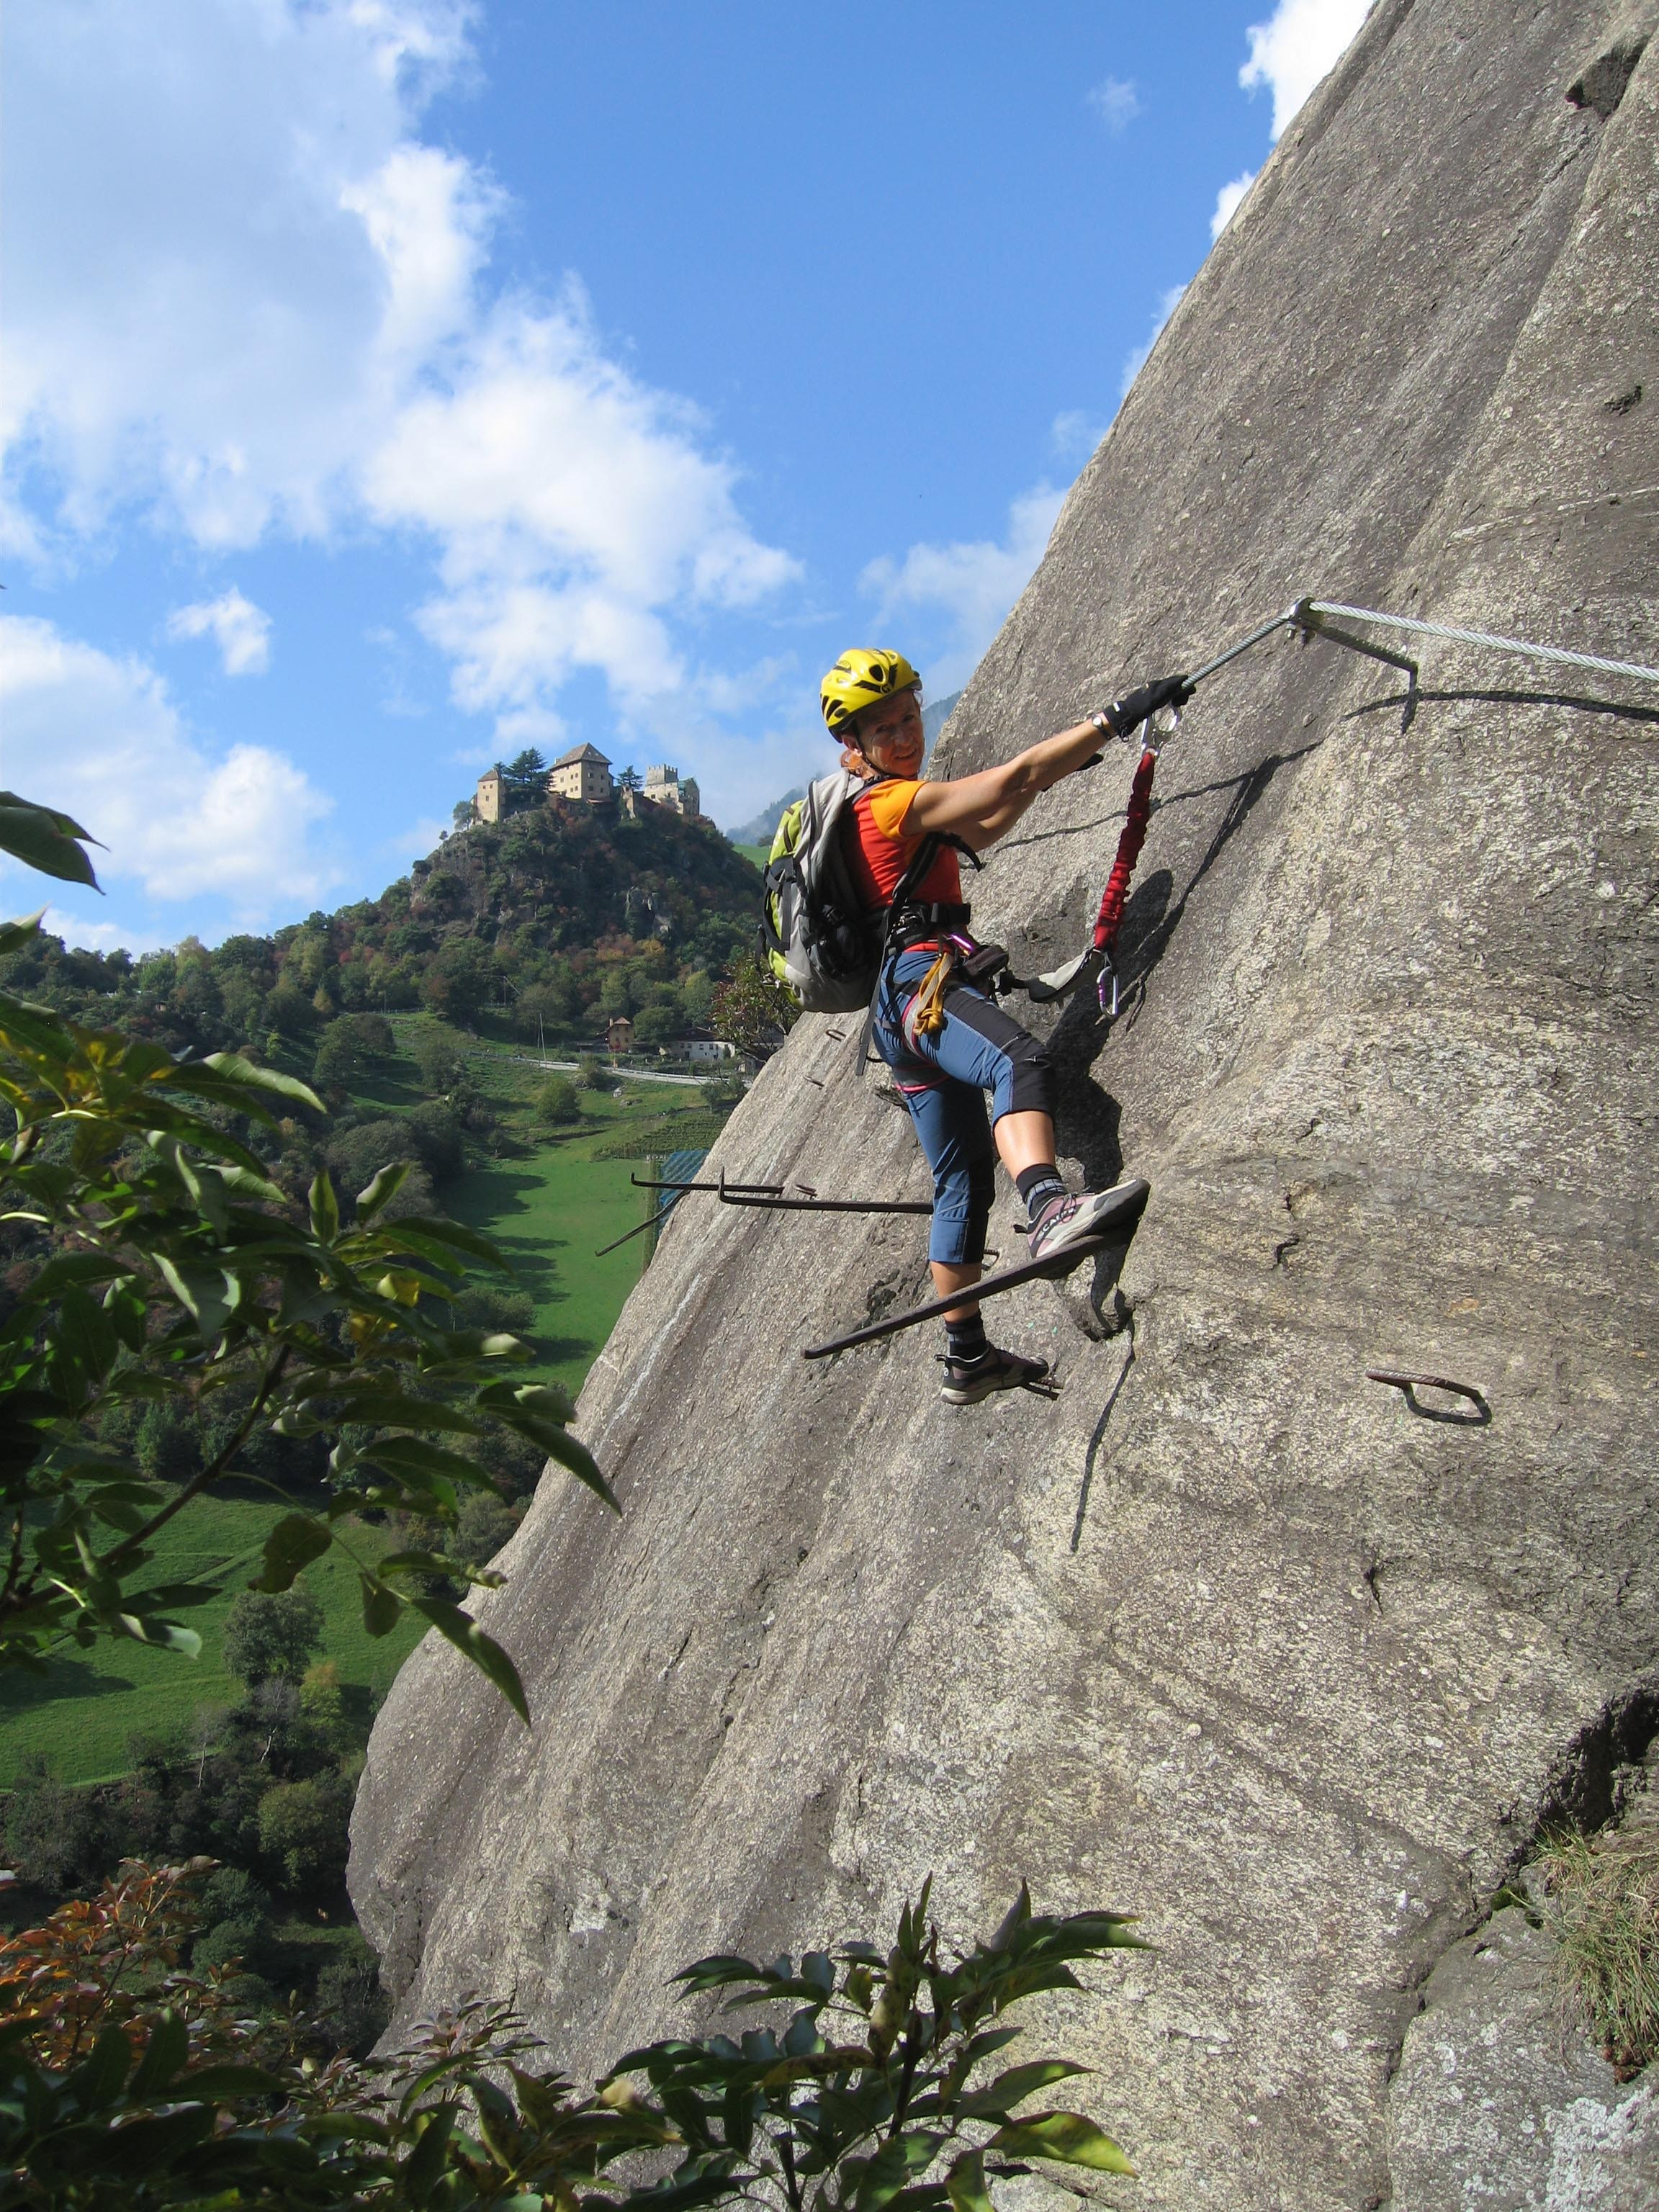 Klettersteig Bandschlinge : Klettersteige hoachwool km bergwelten